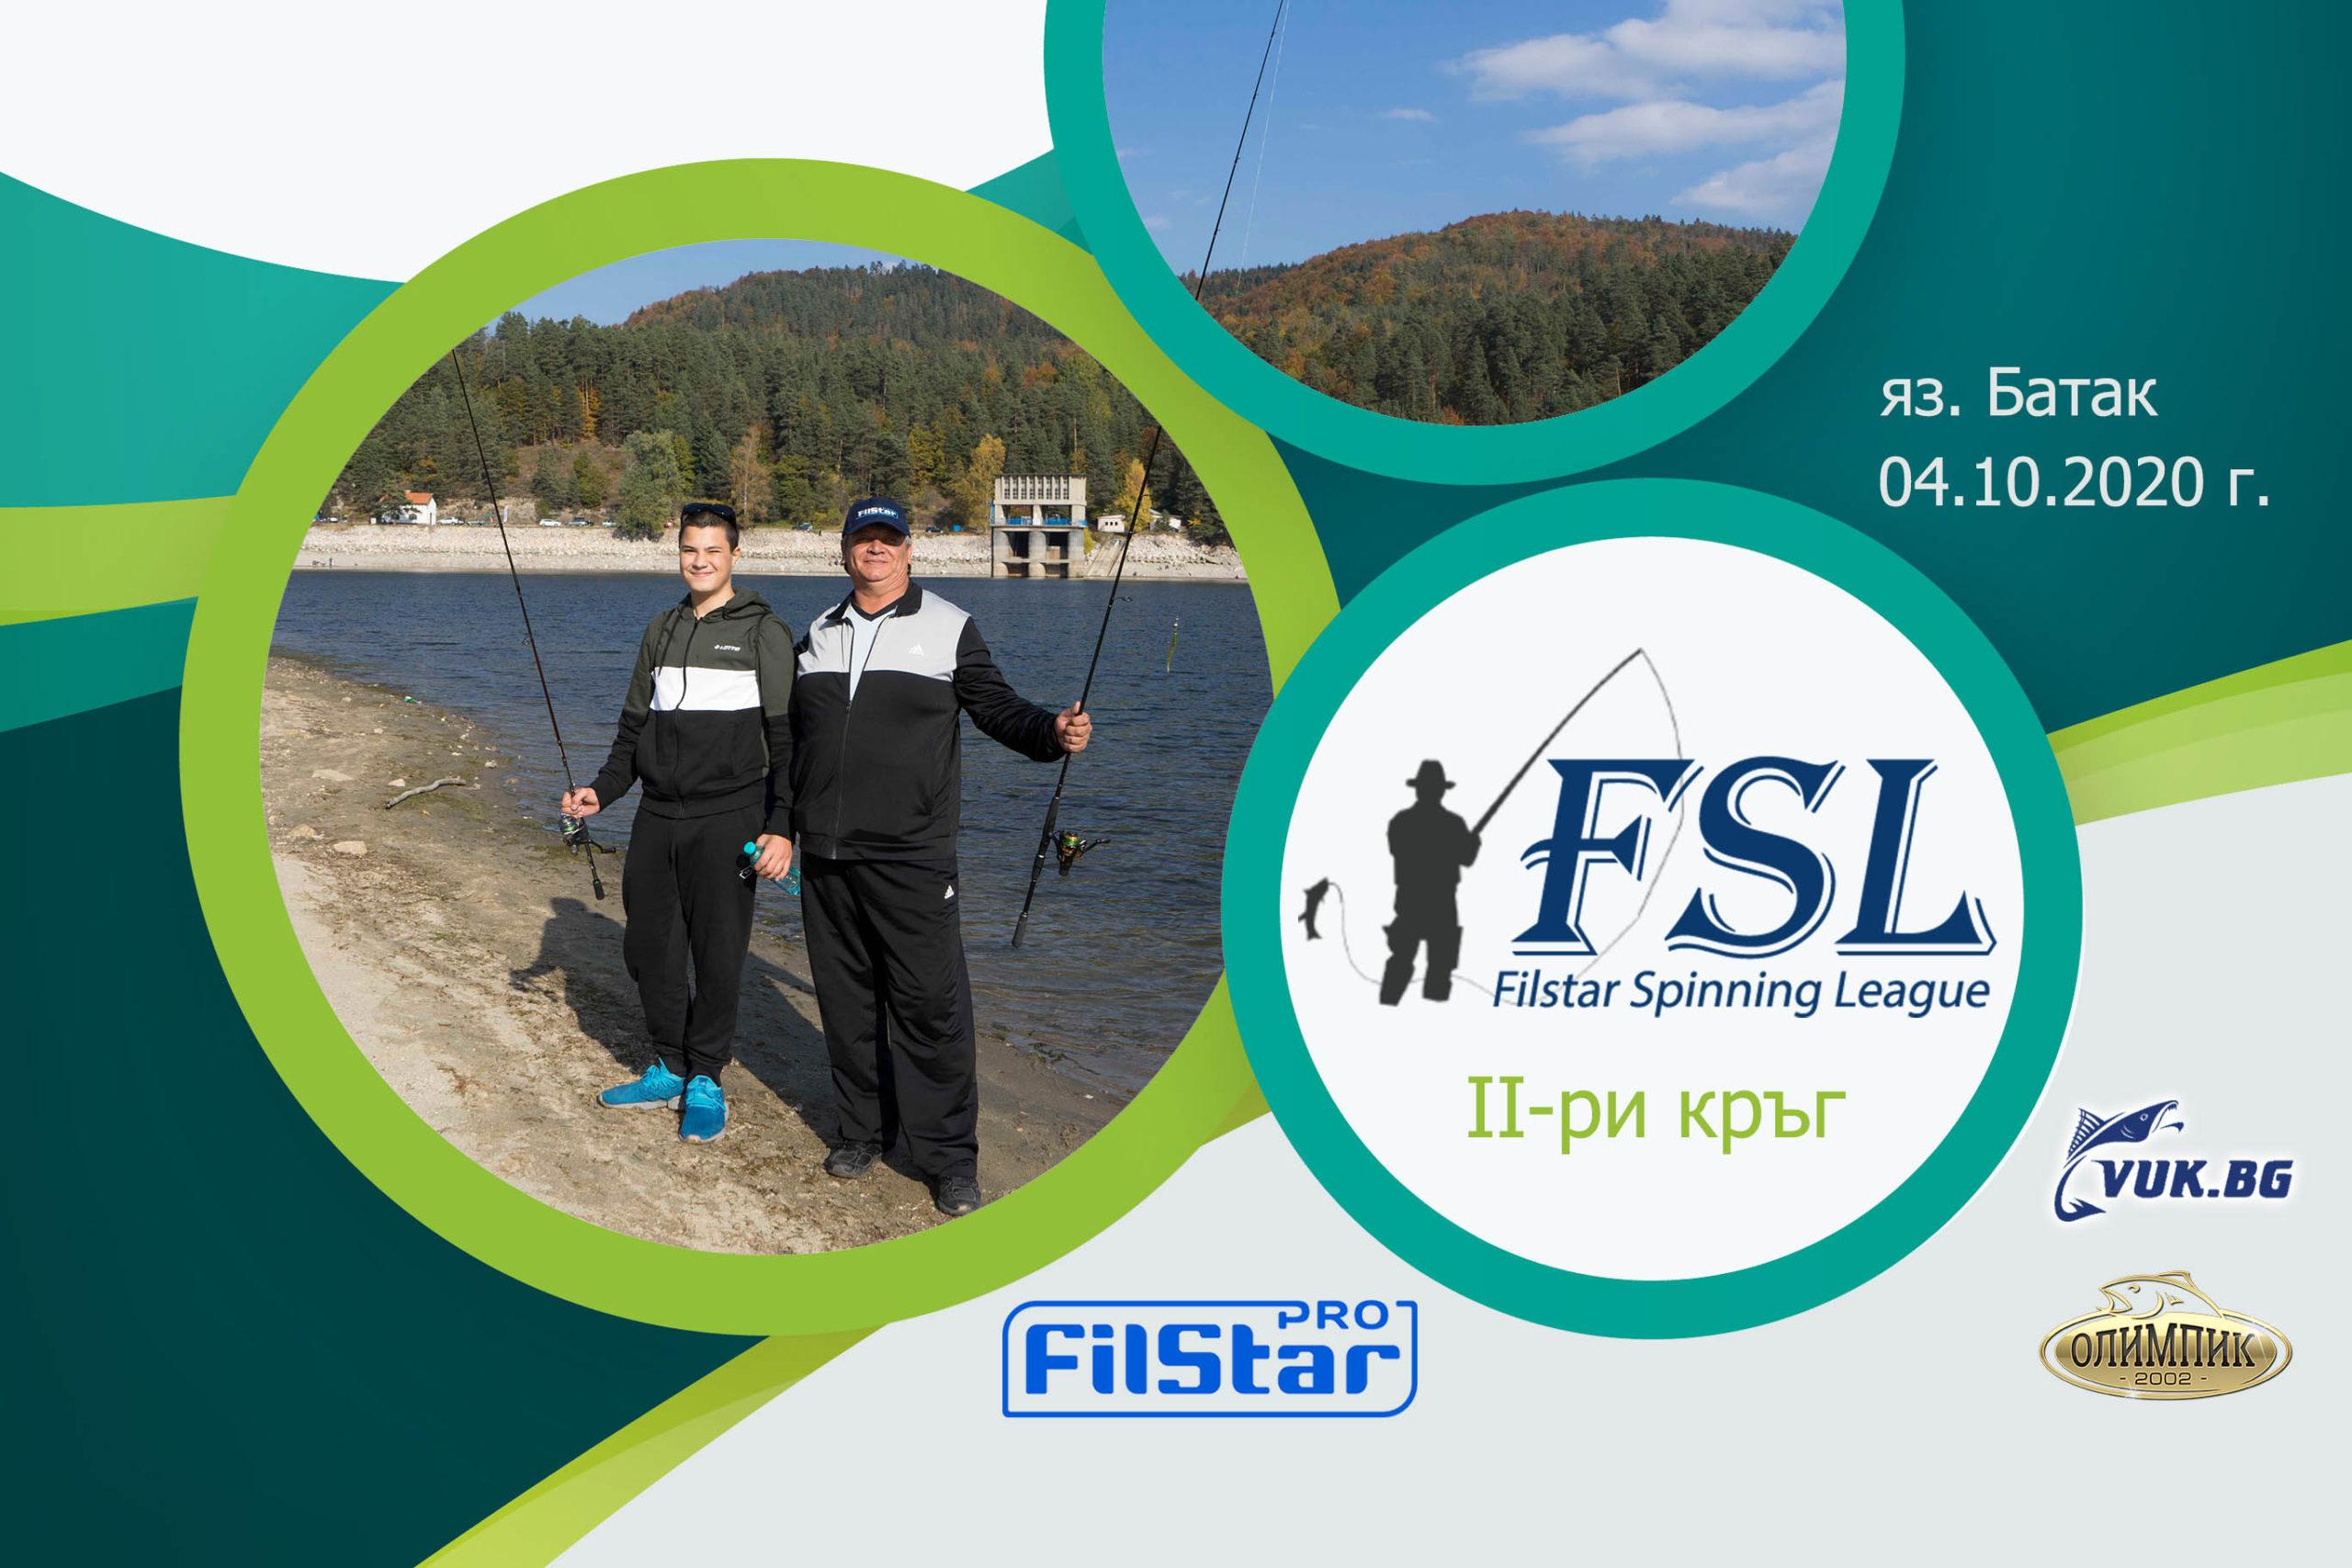 FilStar Спининг Лига 2020 - язовир Батак (организация и регламент)